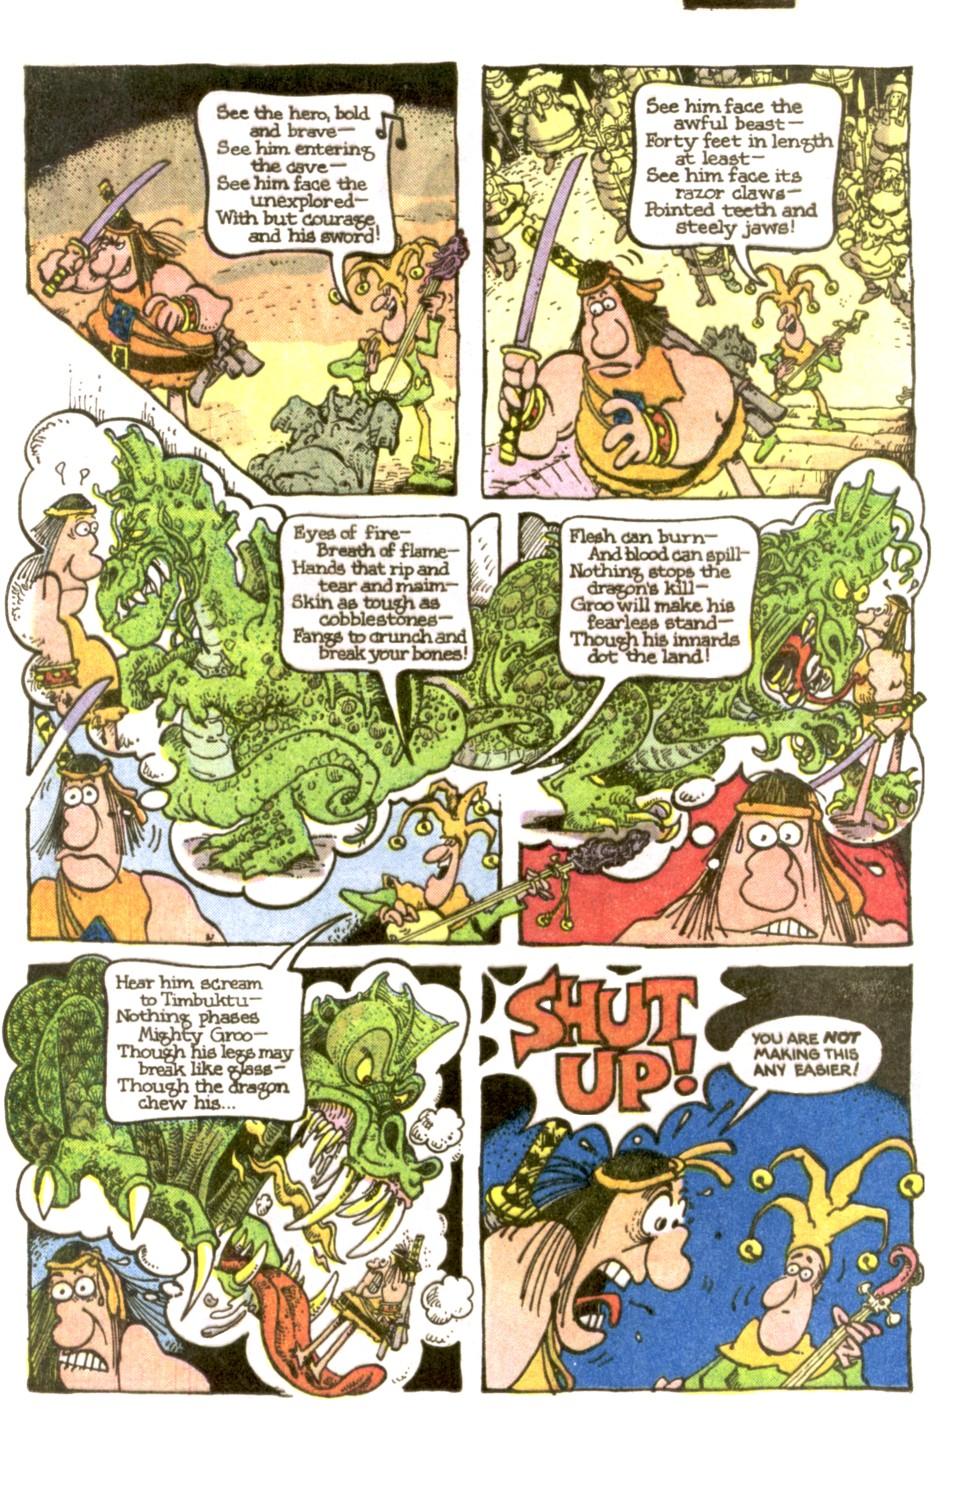 Read online Sergio Aragonés Groo the Wanderer comic -  Issue #2 - 11